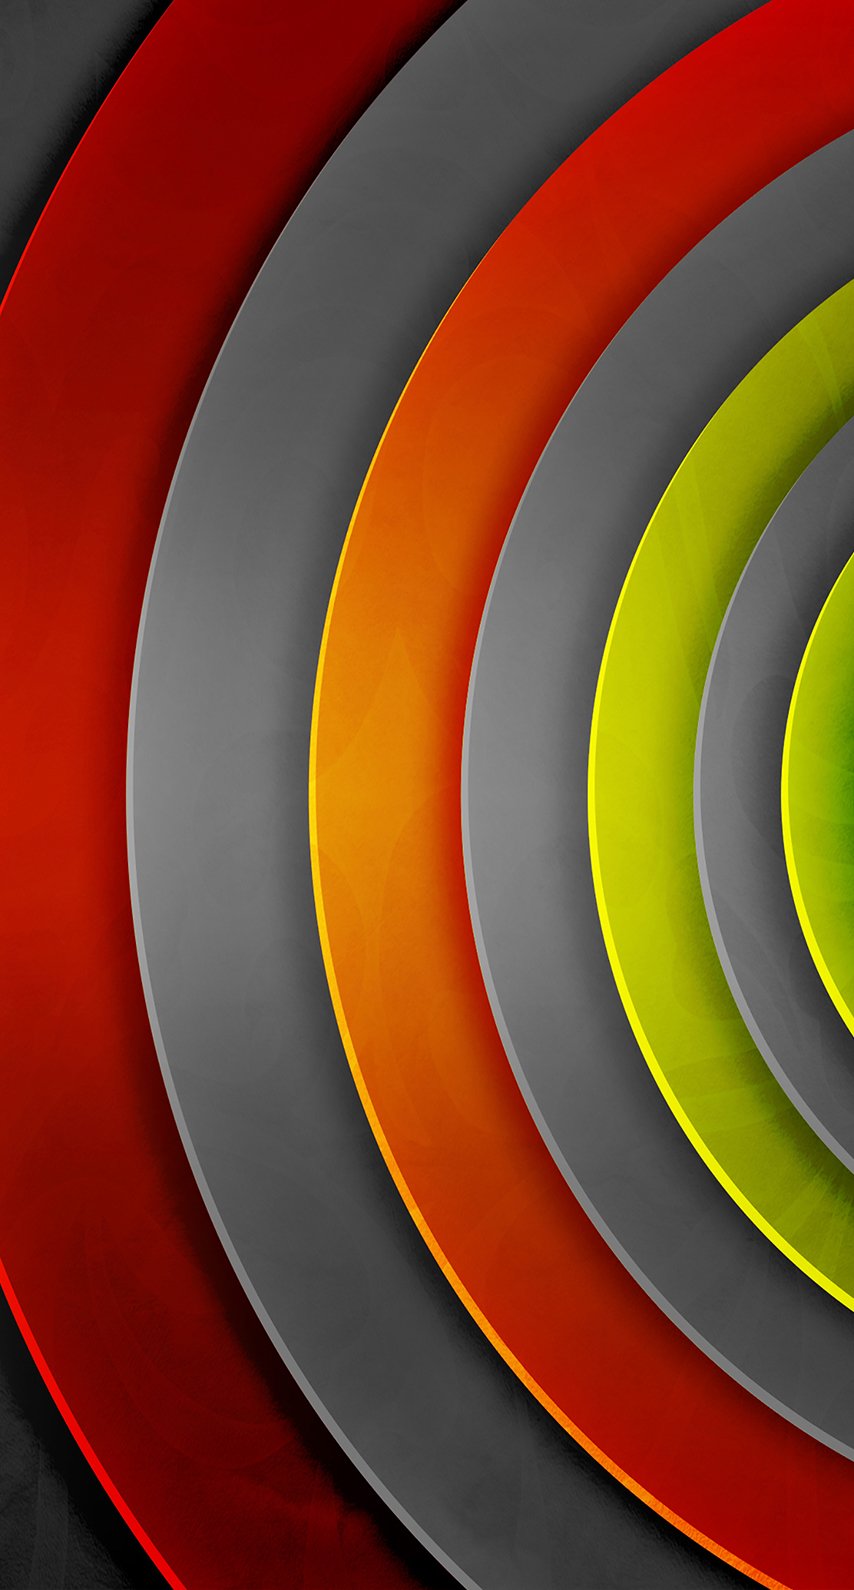 spiral, abstract, pattern, bright, circular, artistic, art, modern, summer, graphic, round, sun